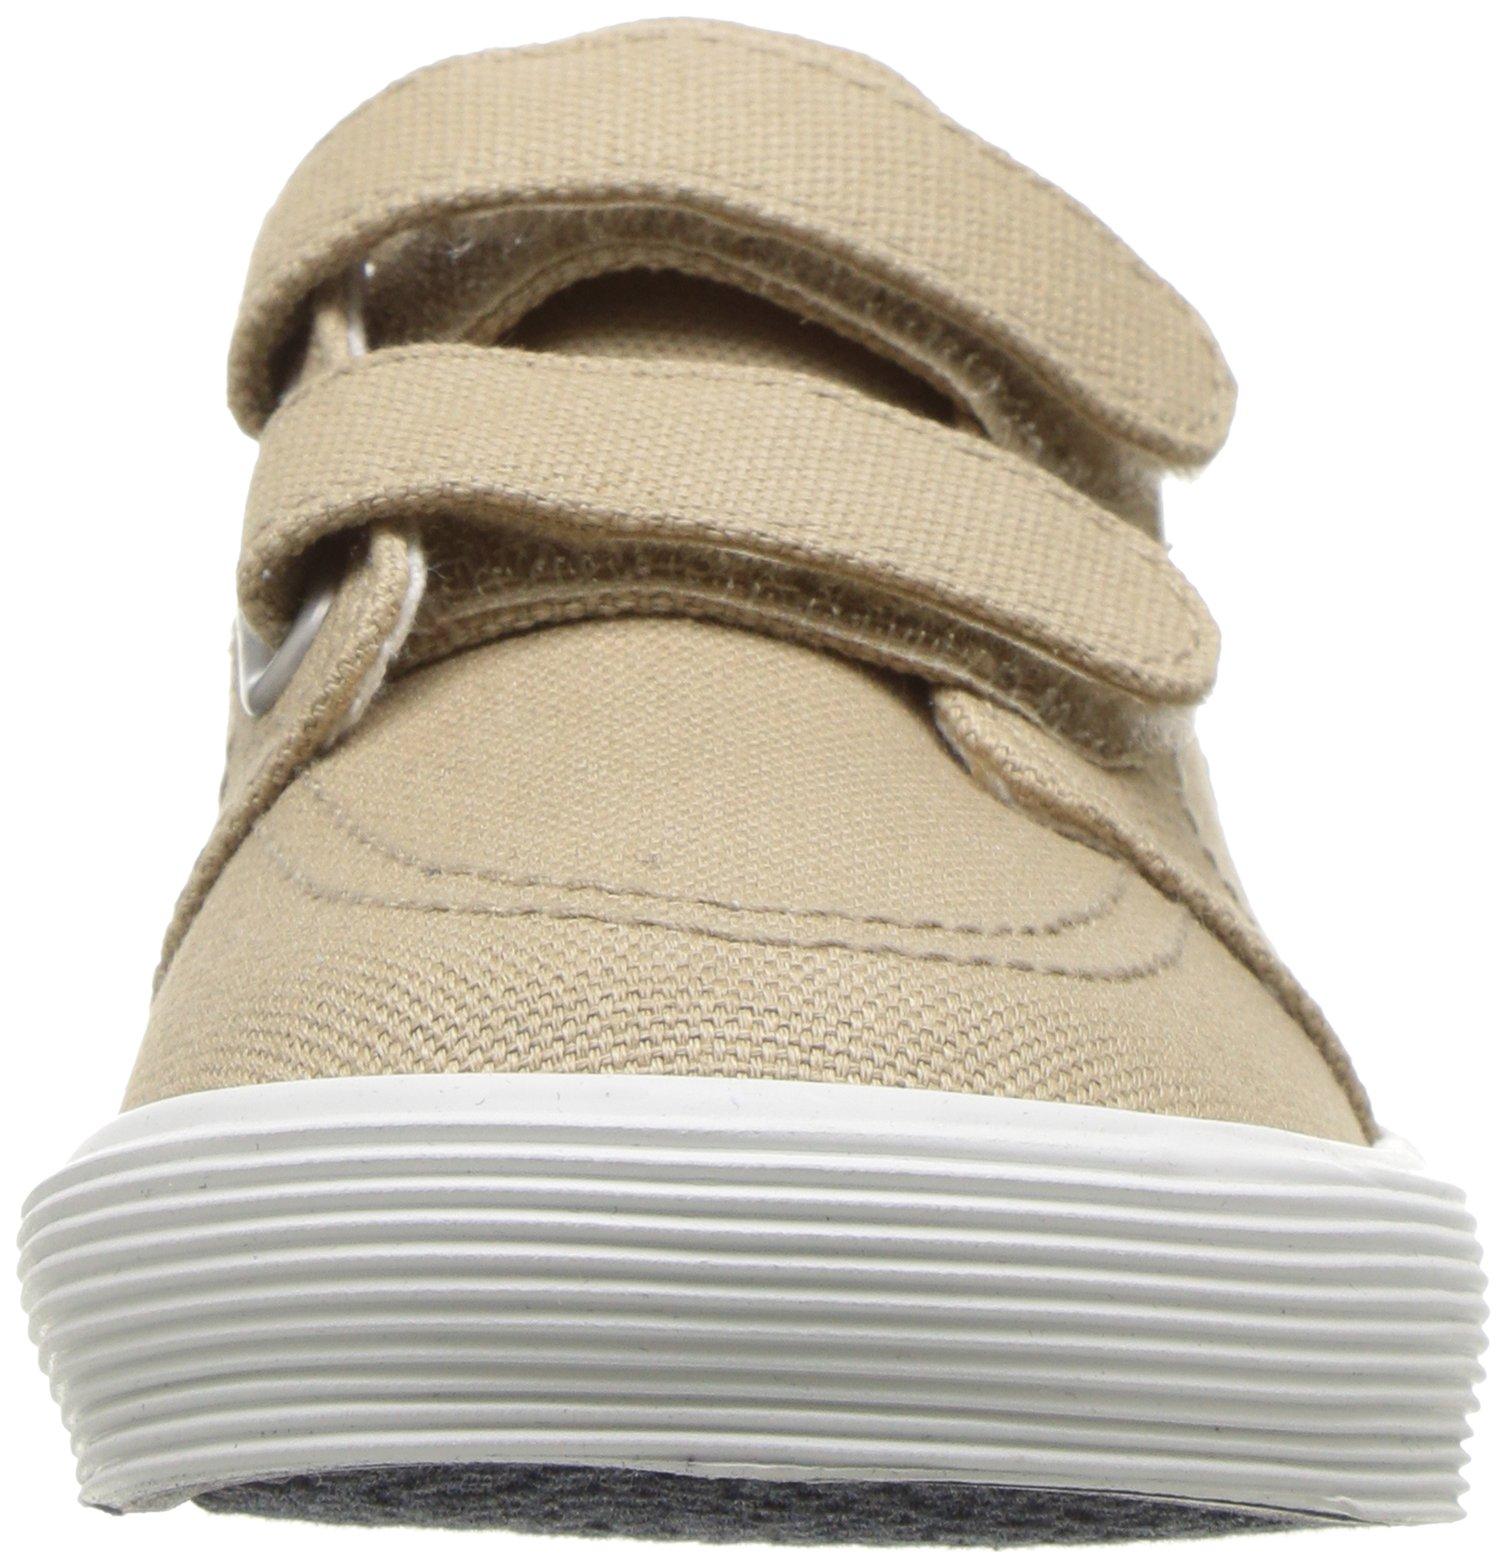 Polo Ralph Lauren Kids Boys' Faxon II Sneaker, Khaki Cotton, 10 M US Toddler by Polo Ralph Lauren (Image #4)